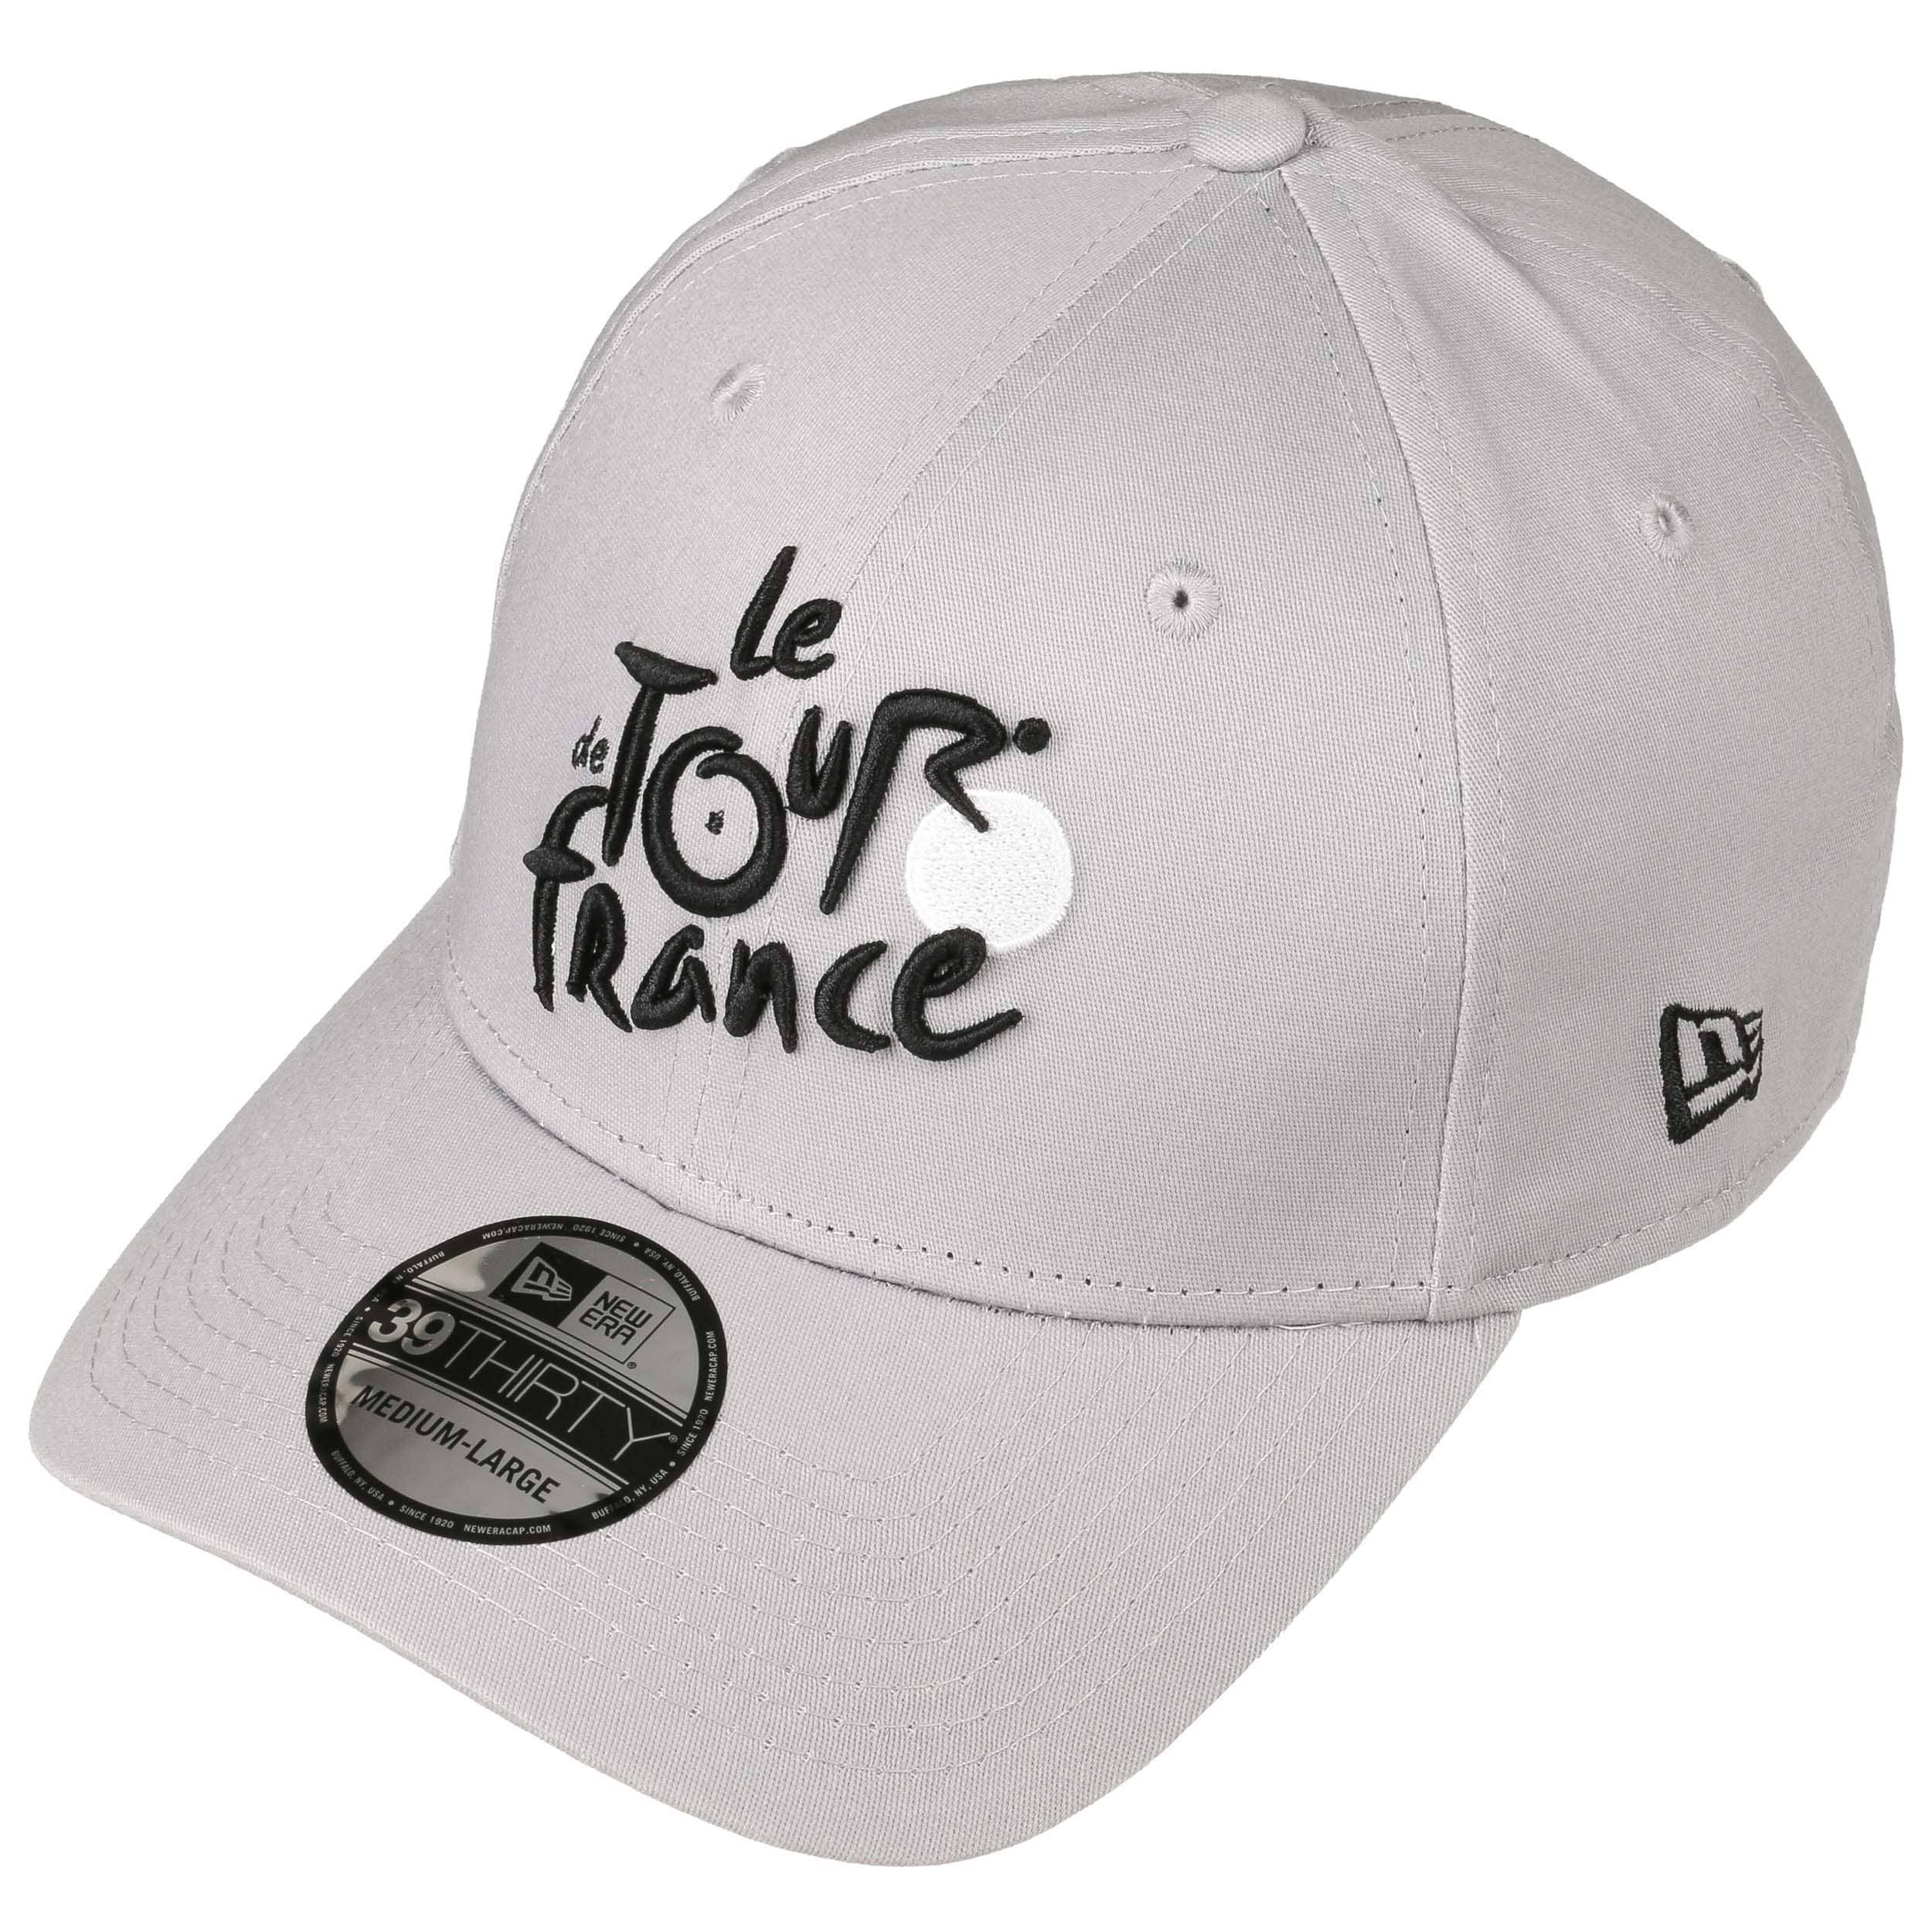 c4a936eeb98 39Thirty Le Tour De France Cap by New Era - grey 1 ...